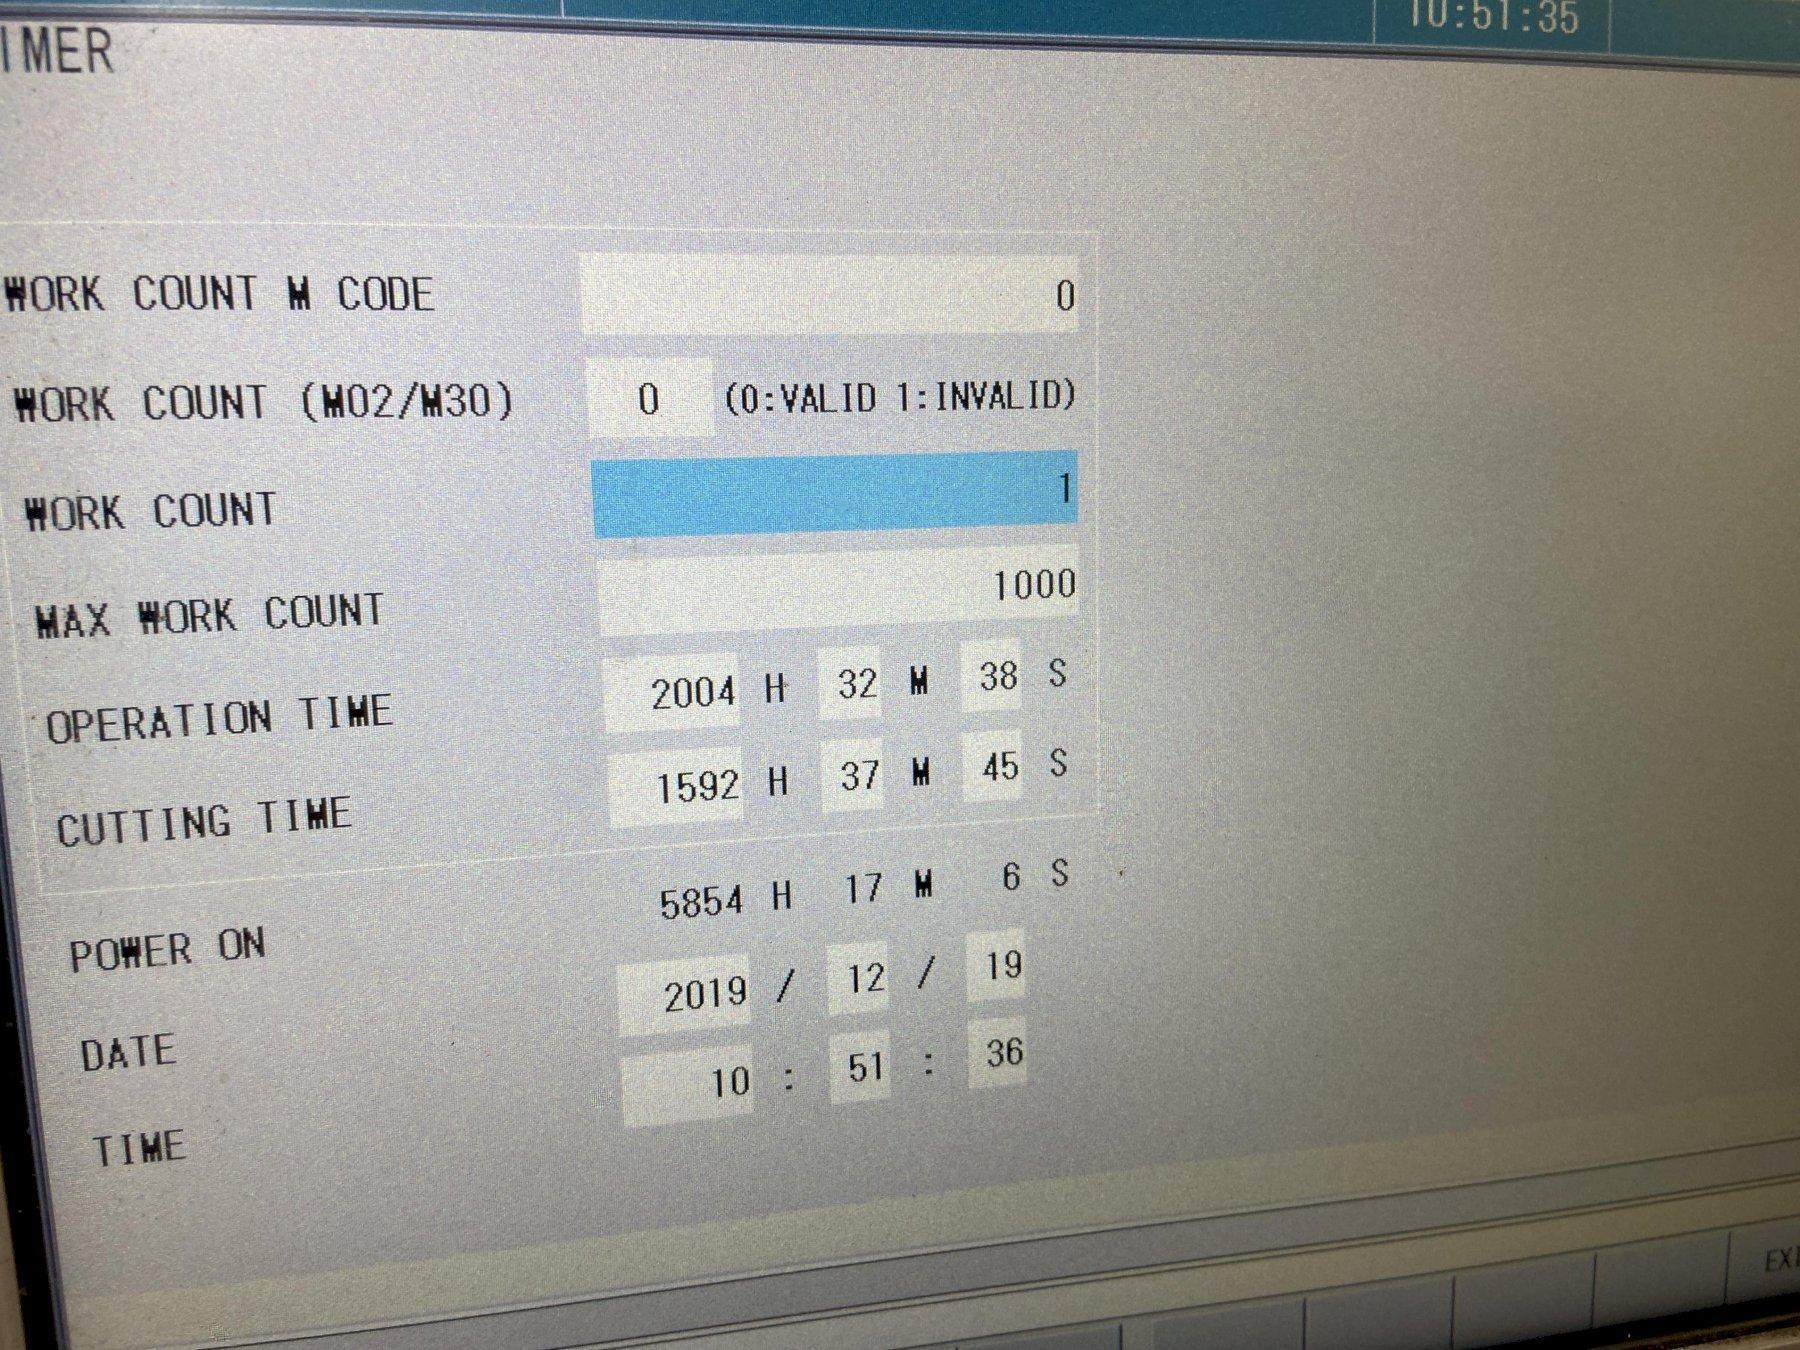 bc75ff7fa7c93911d66636932445c82f-7a9b51c541fb0c46b521bd7675b39fb6.jpeg